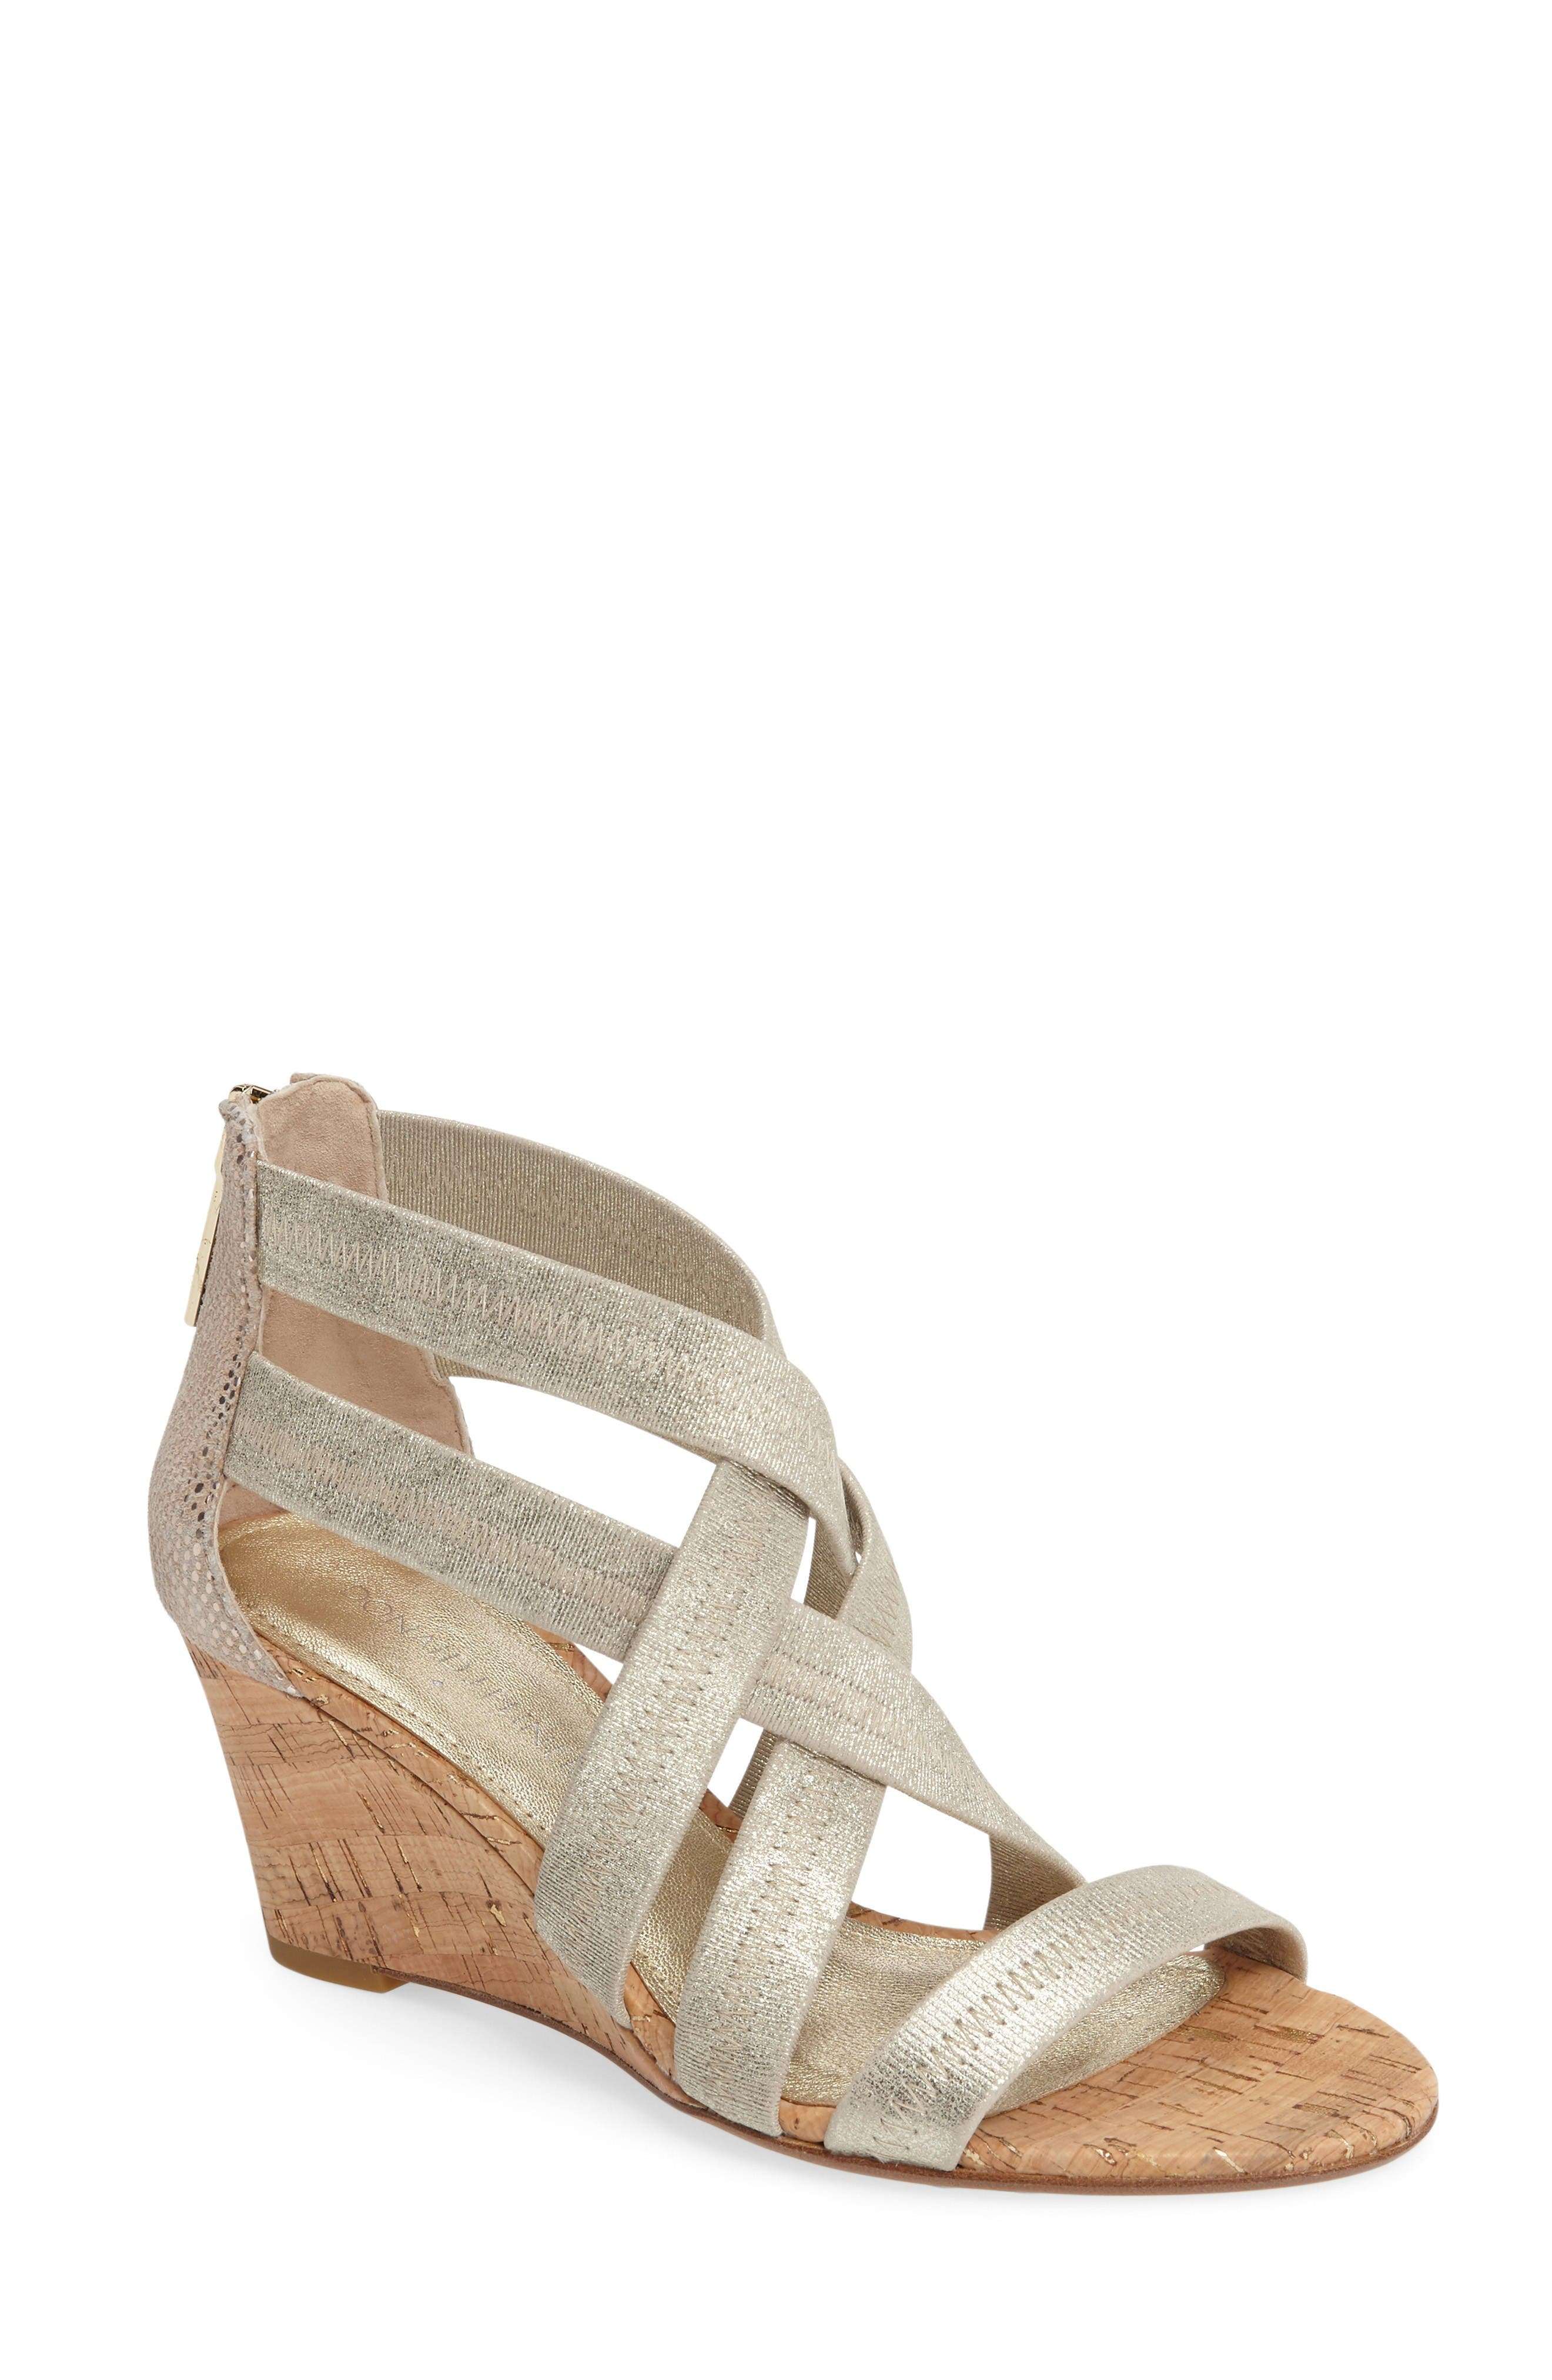 Donald J Pliner Jemi Wedge Sandal,                         Main,                         color, Platino Leather